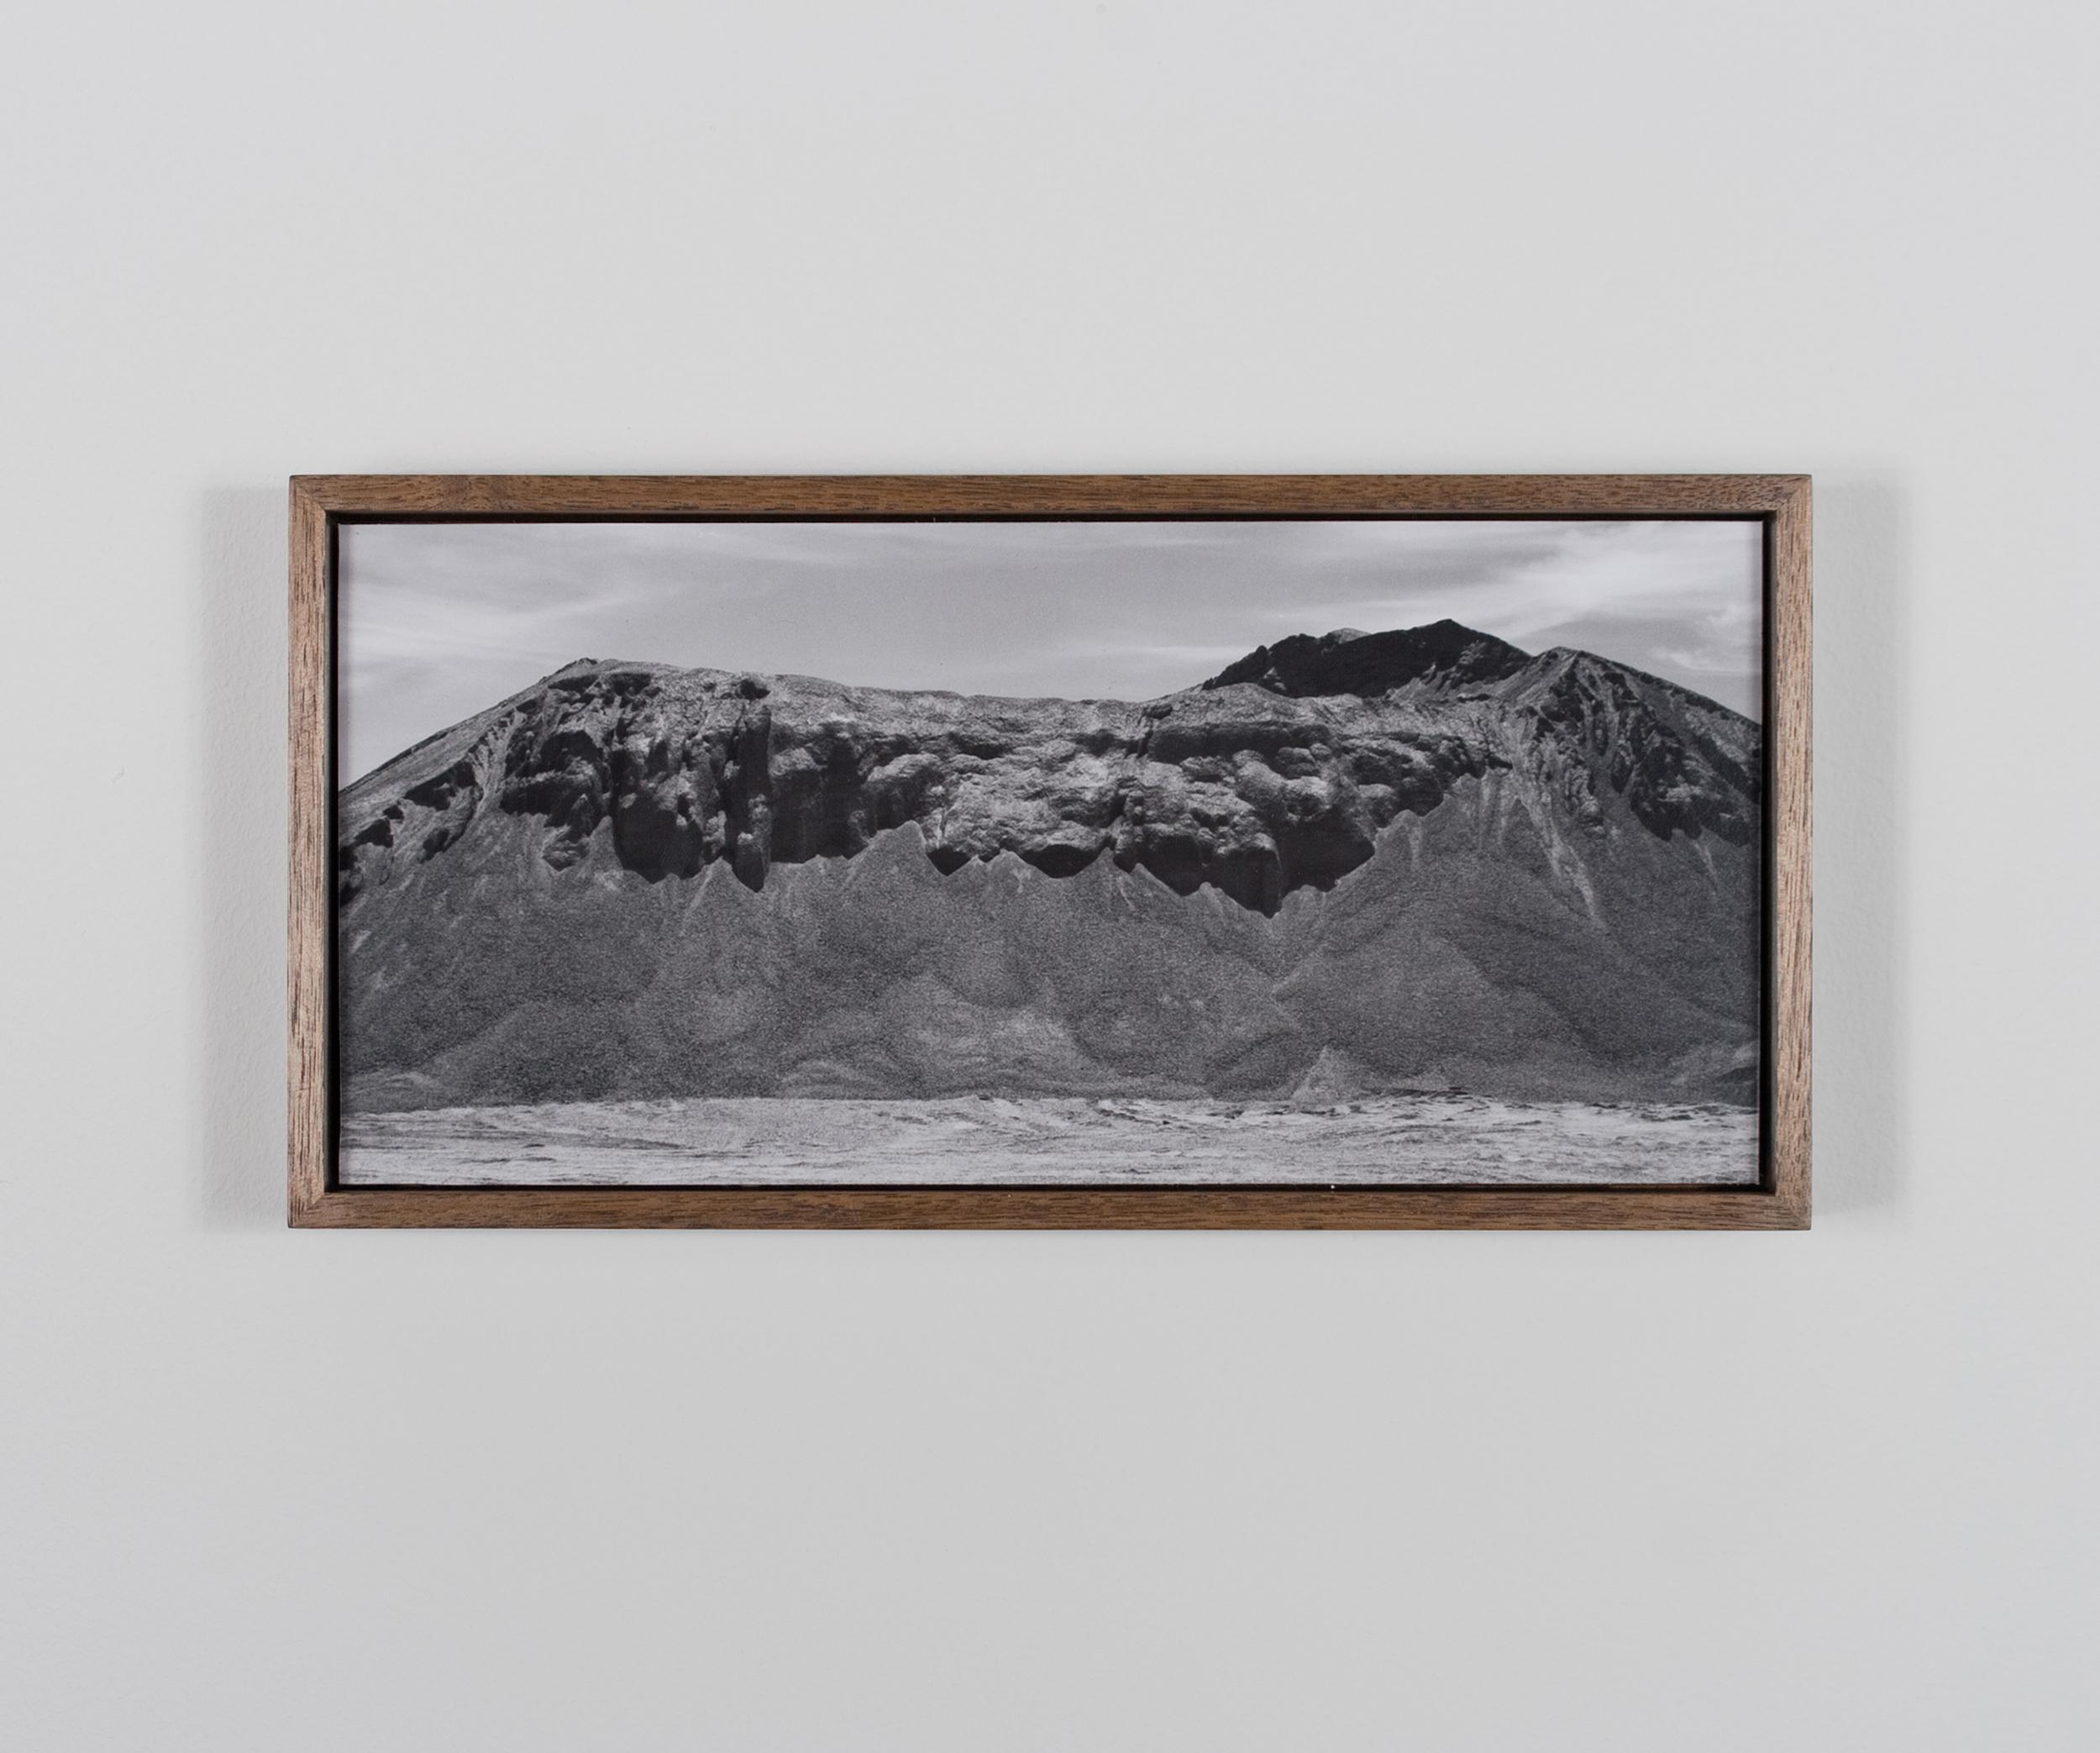 Mistryst Butte 2009/10 Gelatin-silver print on Dibond, with walnut frame